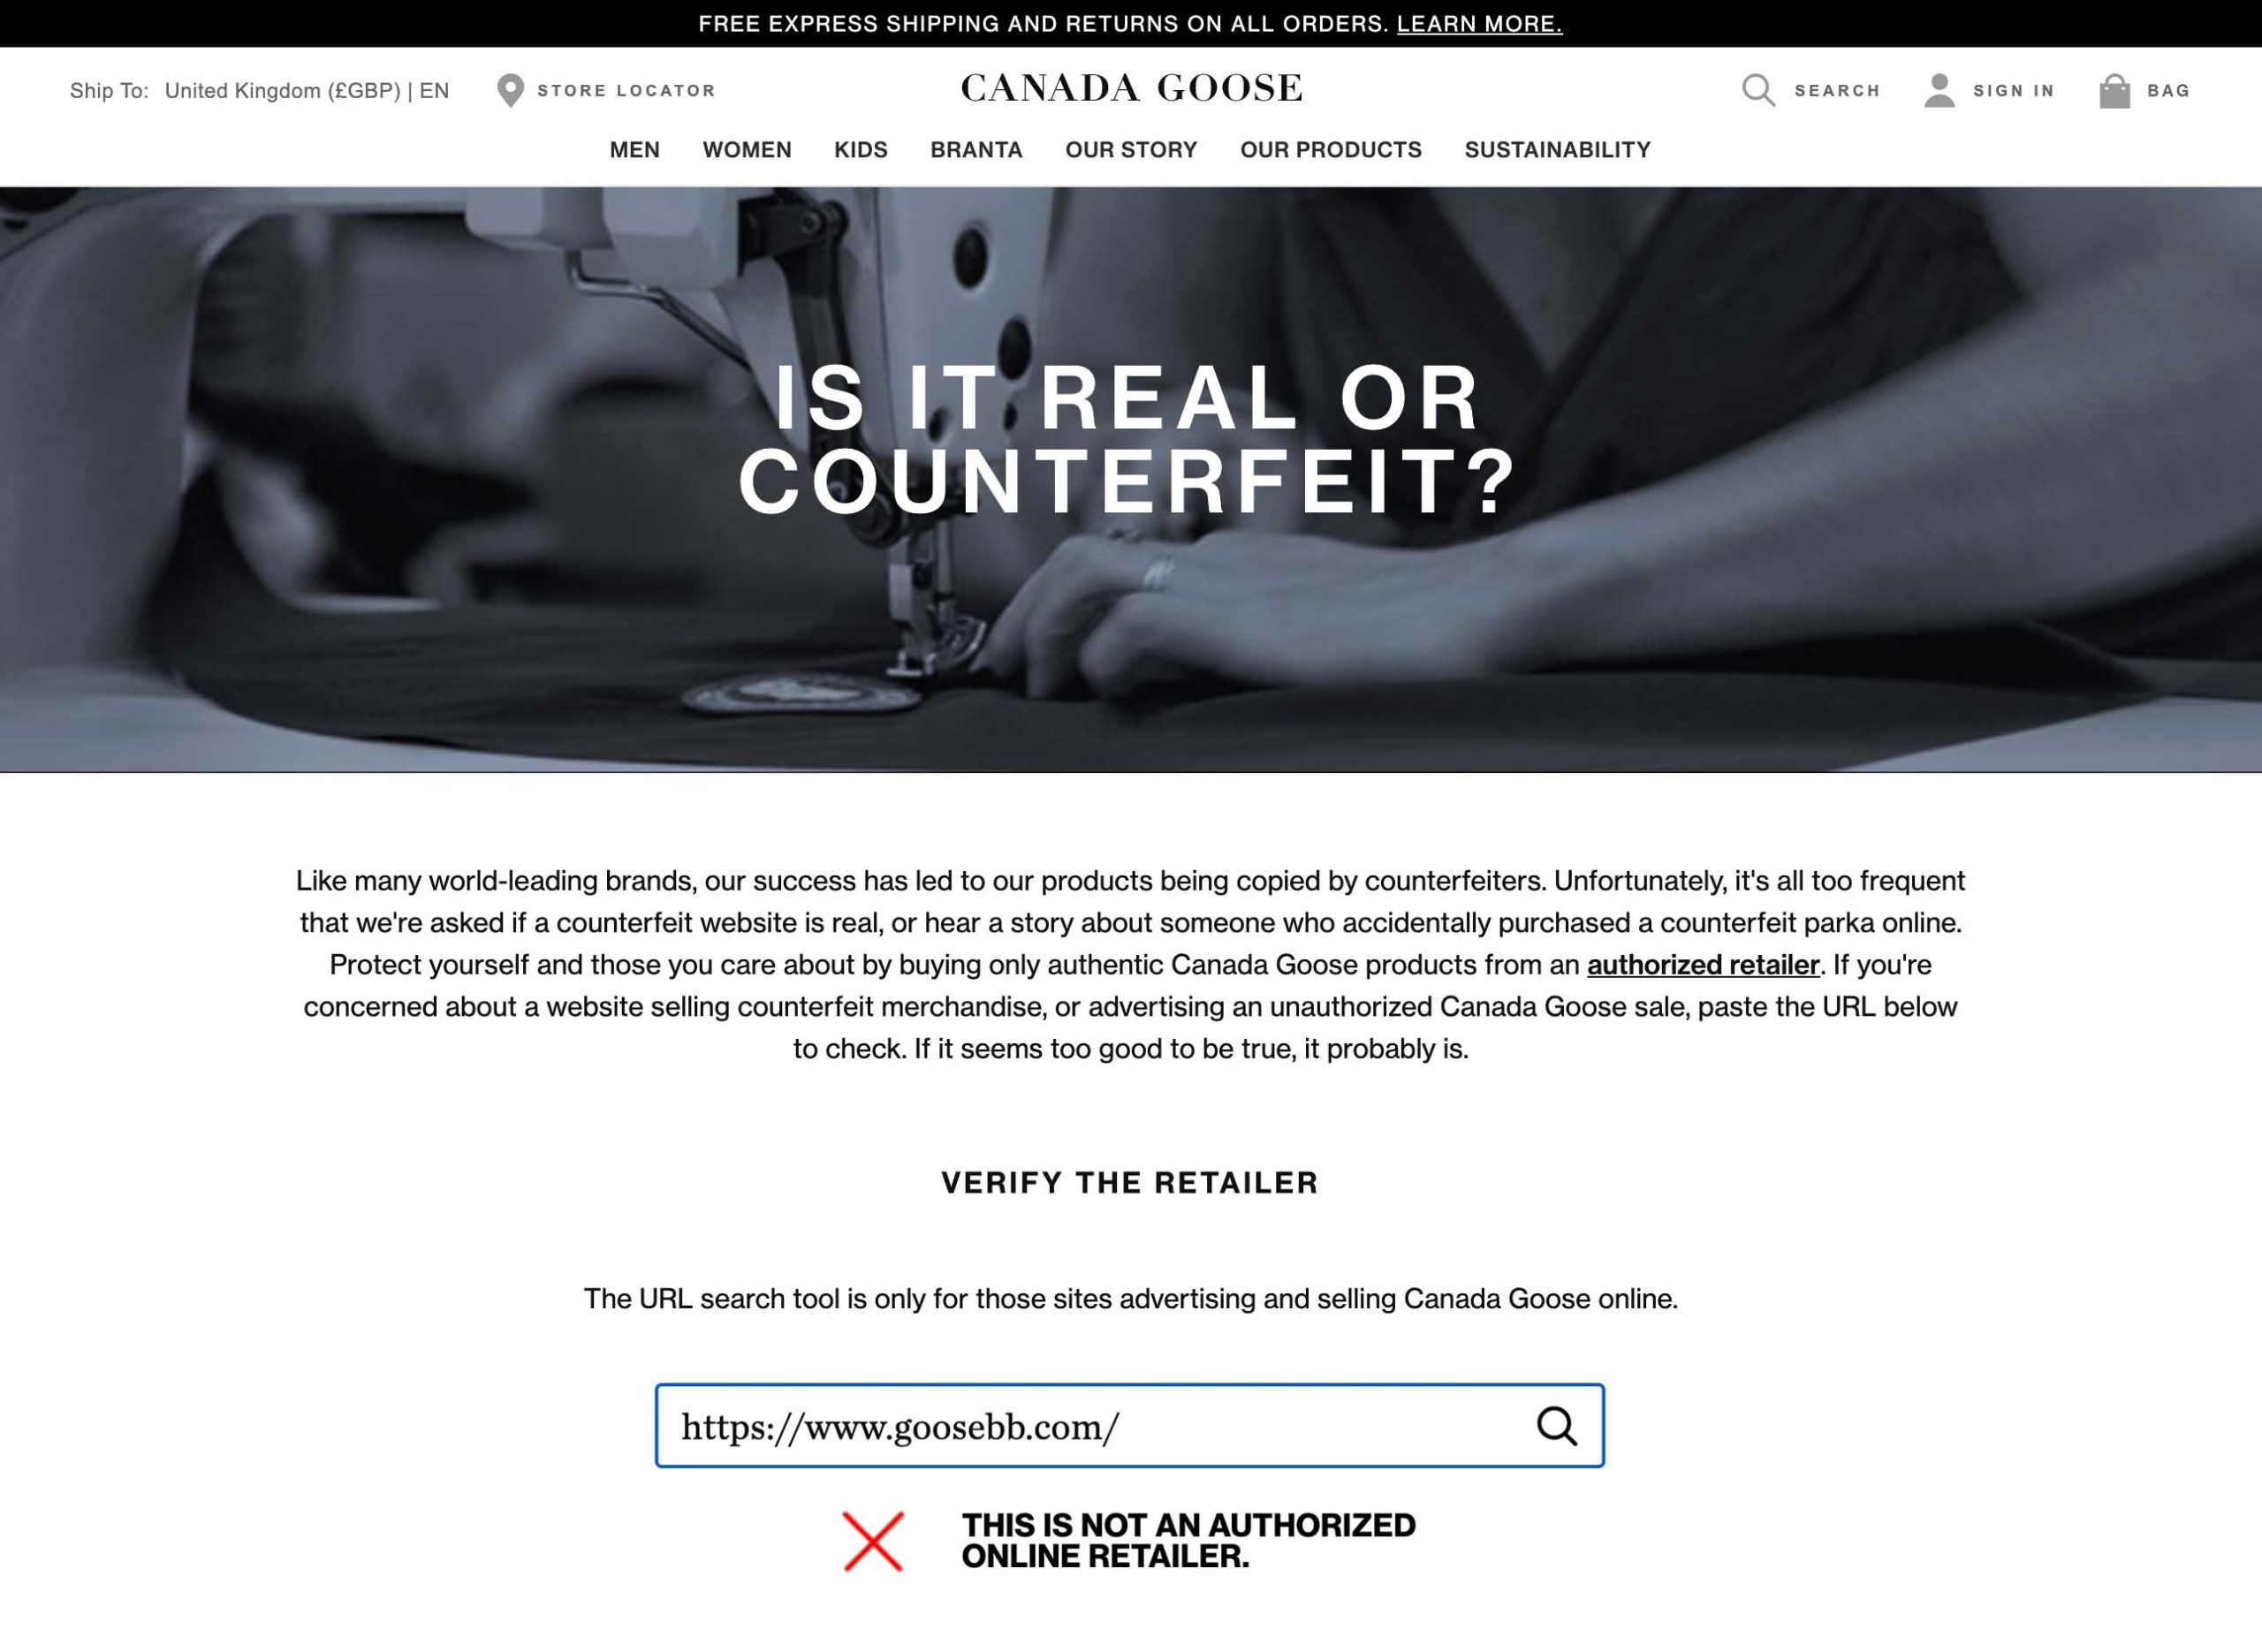 canadagoose-uk-en-counterfeit-counterfeit-html-2020-09-19-19_13_29-scaled